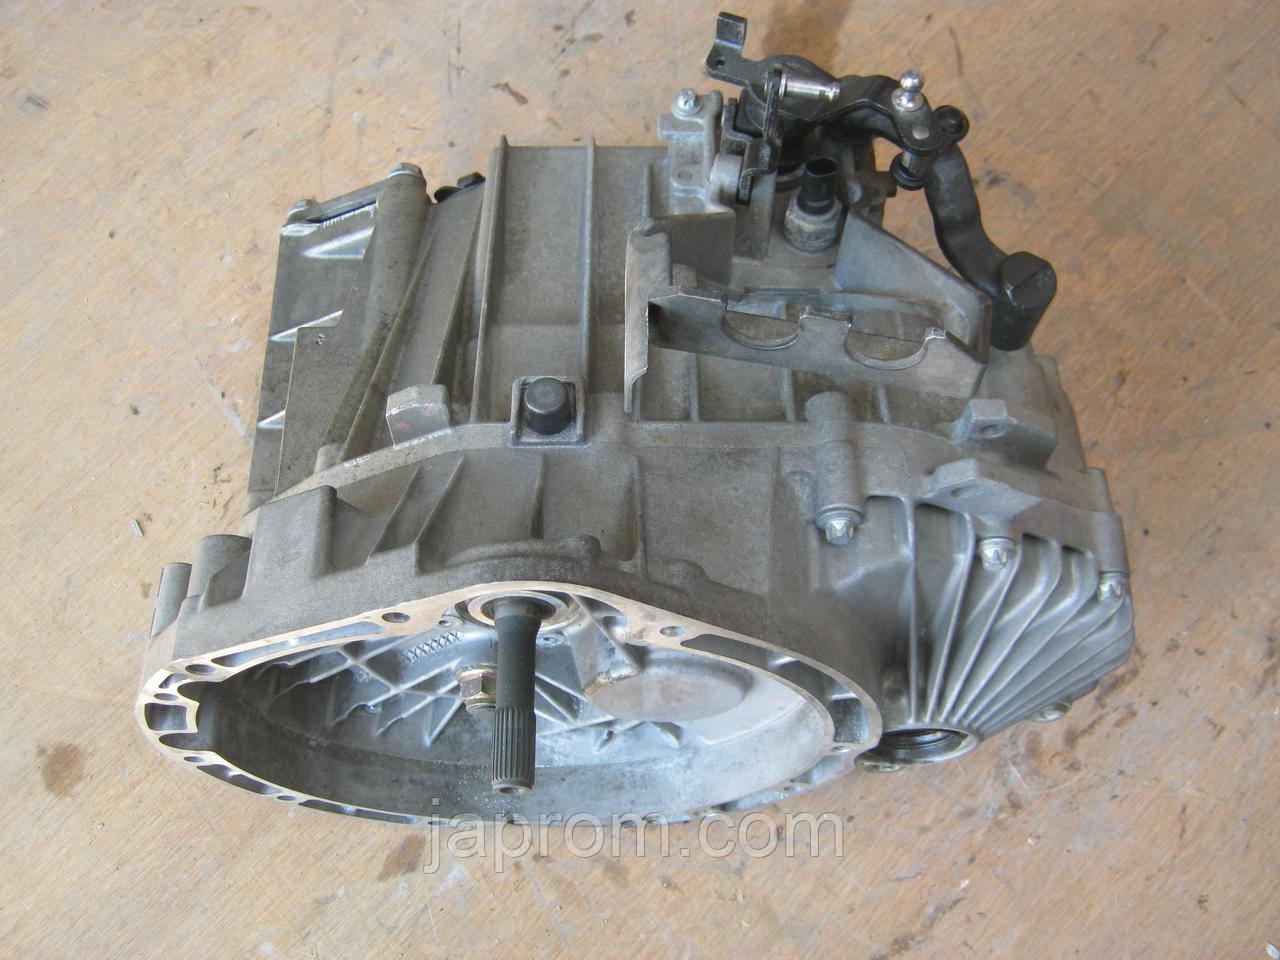 МКПП механічна коробка передач Mercedes Benz W168 1.6 716.501